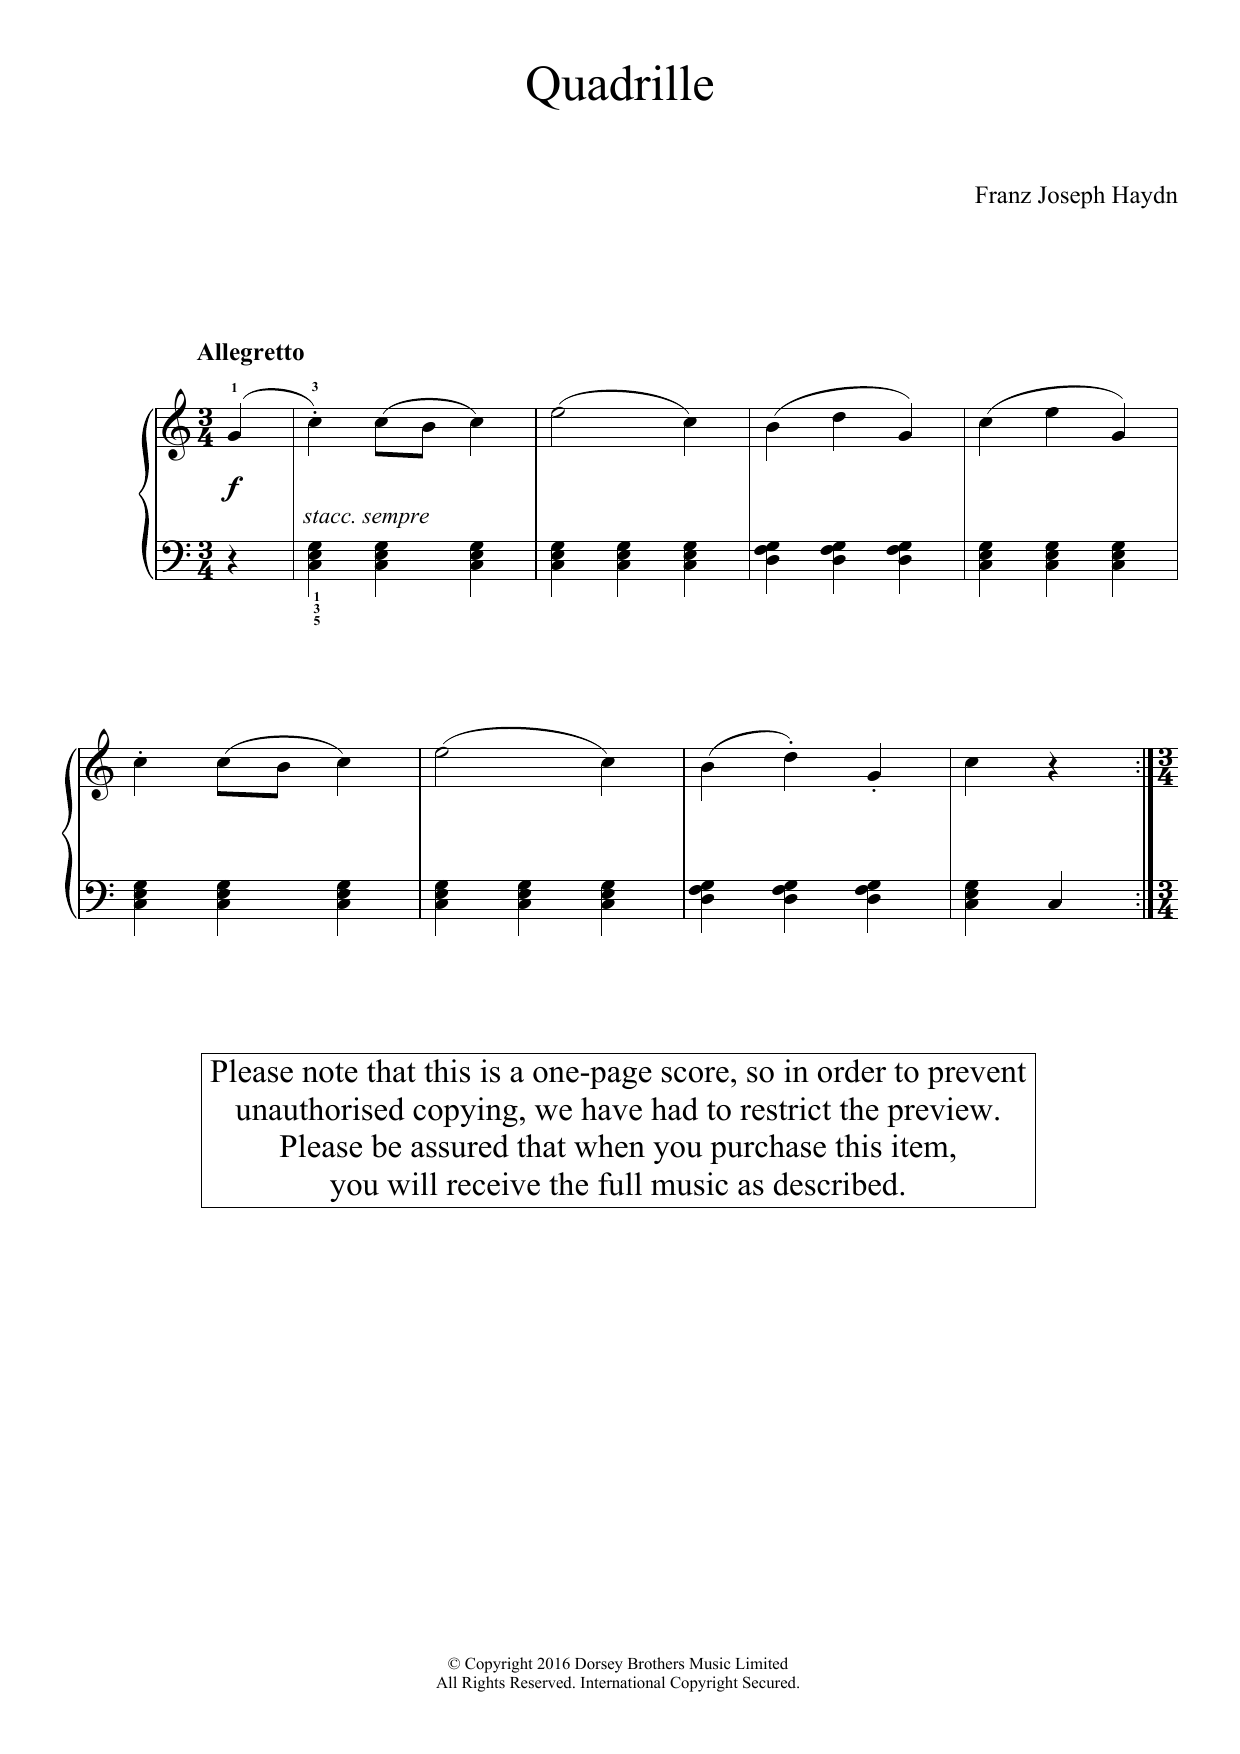 Franz Joseph Haydn - Quadrille